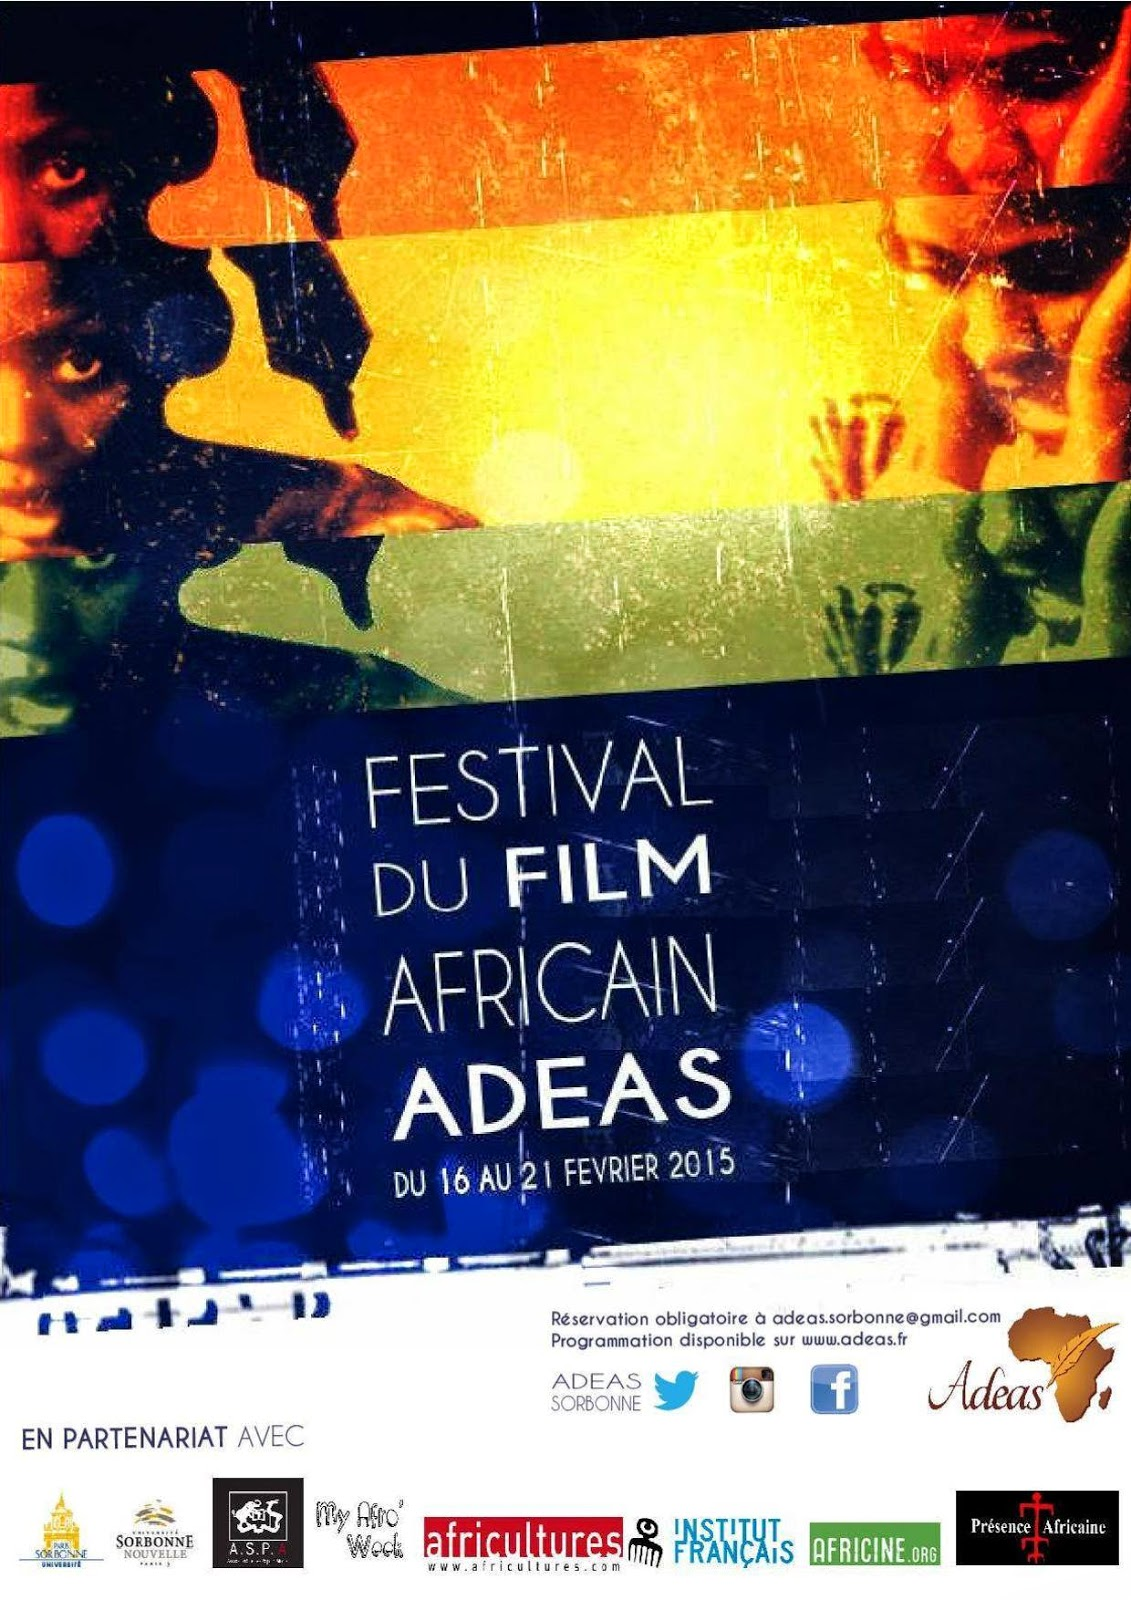 Festival du Film Africain - ADEAS